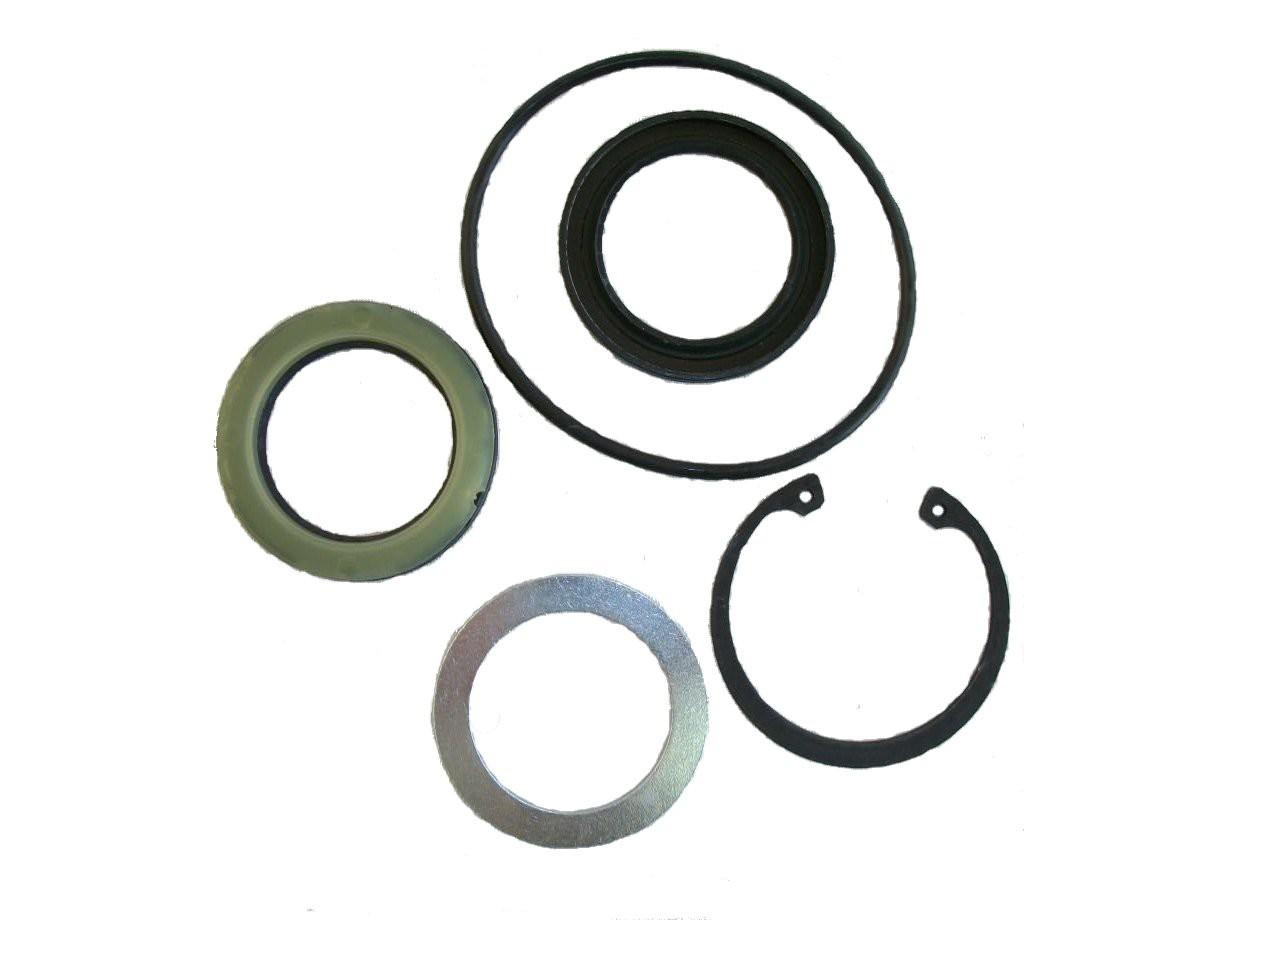 OMEGA - Steering Gear Pitman Shaft Seal Kit - OME 2805